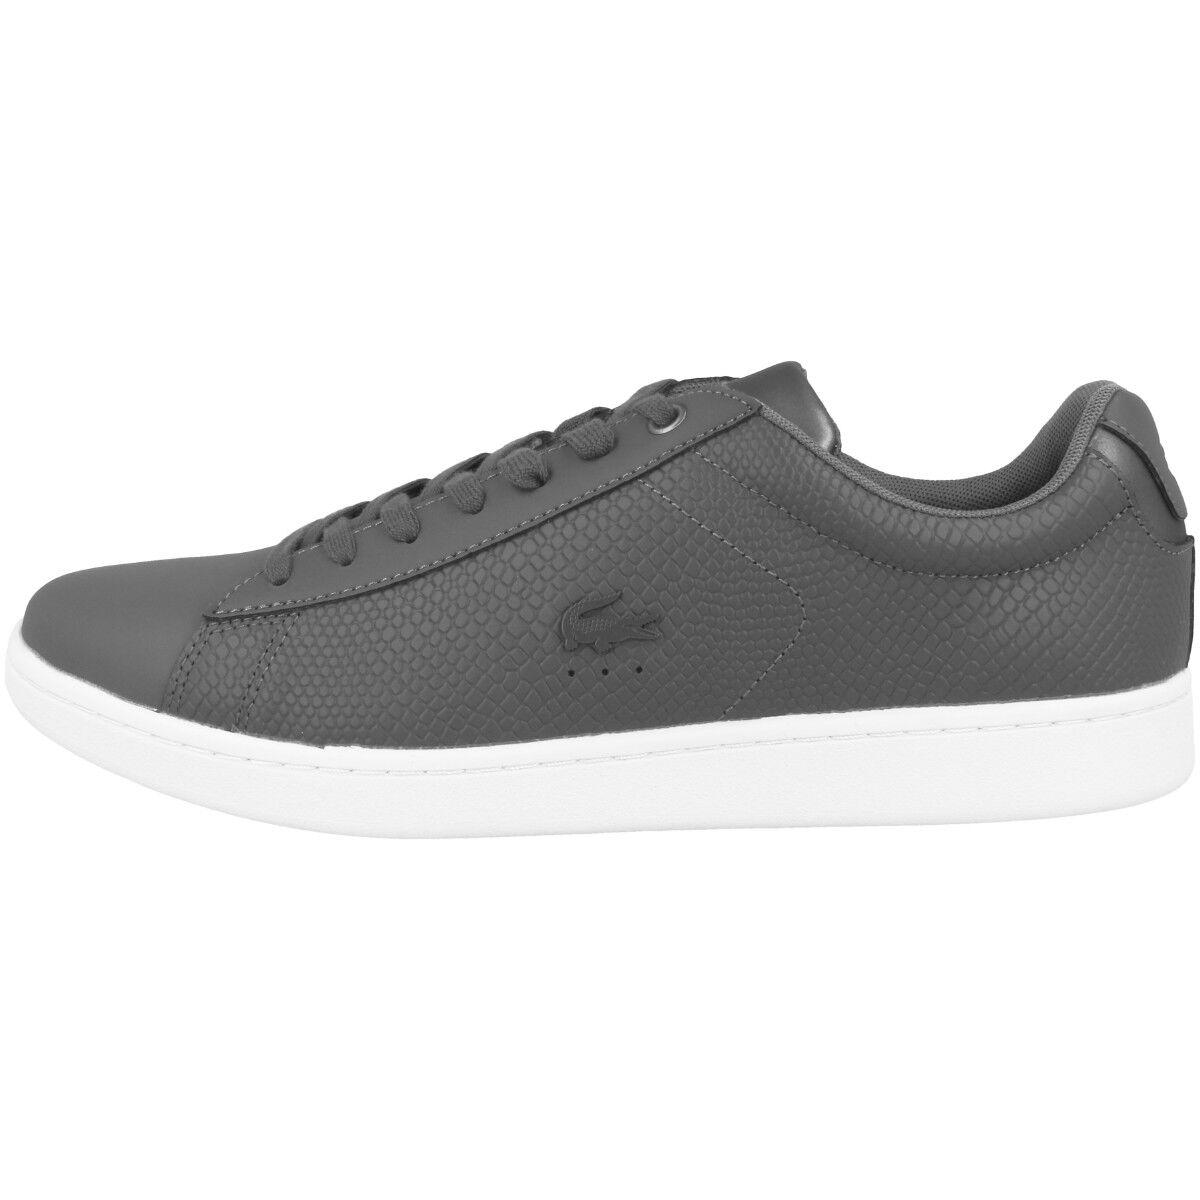 Lacoste Carnaby EVO 417 2 Schuhe Herren Leder Turnschuhe dark grau 7-34SPM0043-248